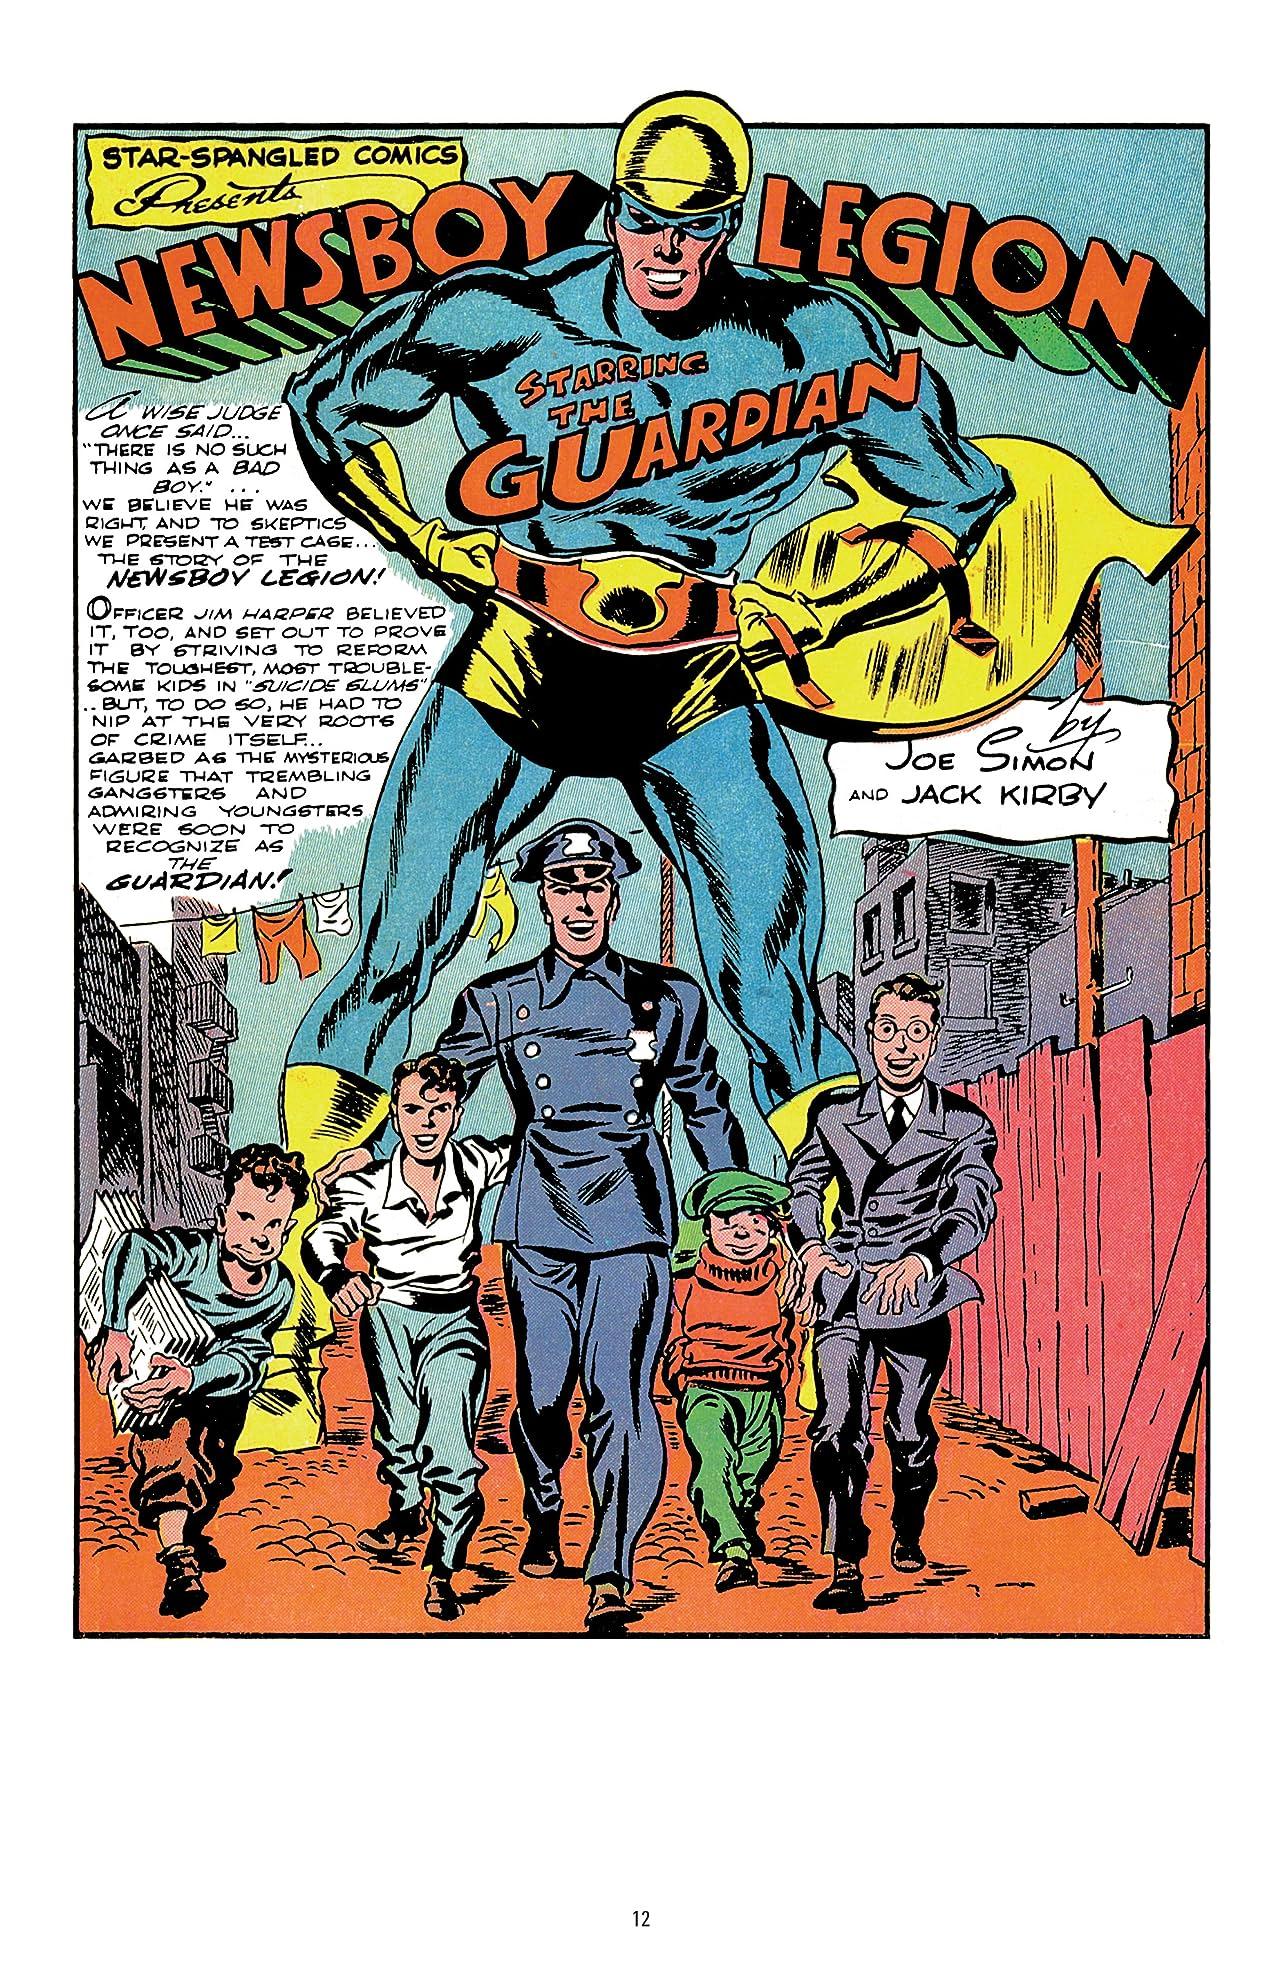 The Newsboy Legion by Joe Simon & Jack Kirby